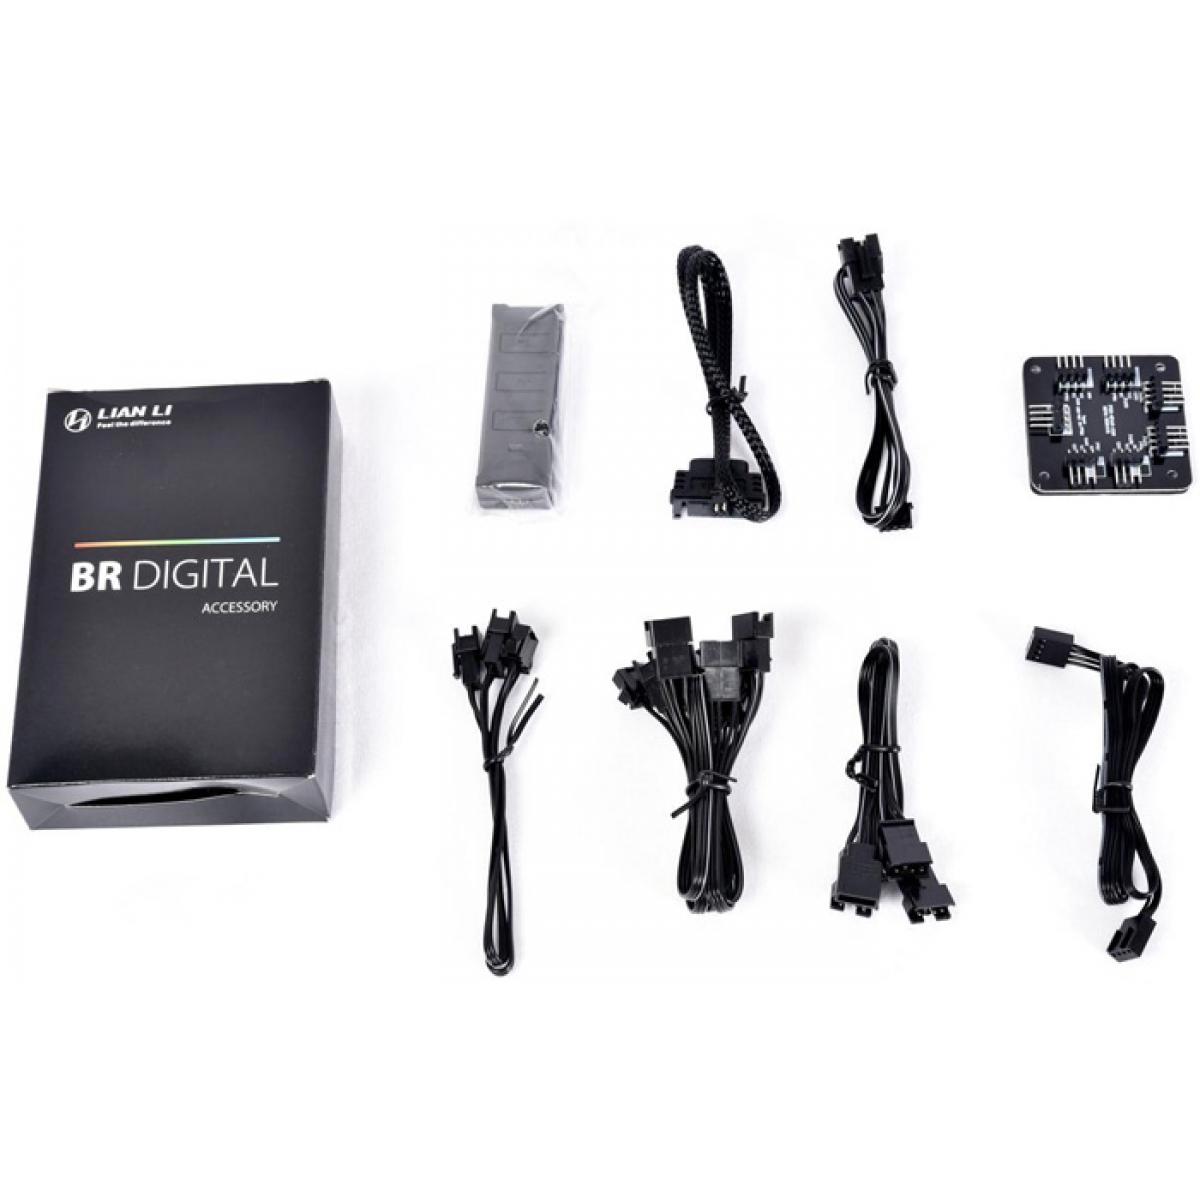 Kit Fan com 3 Unidades Lian Li Bora Digital RGB 120mm, Silver